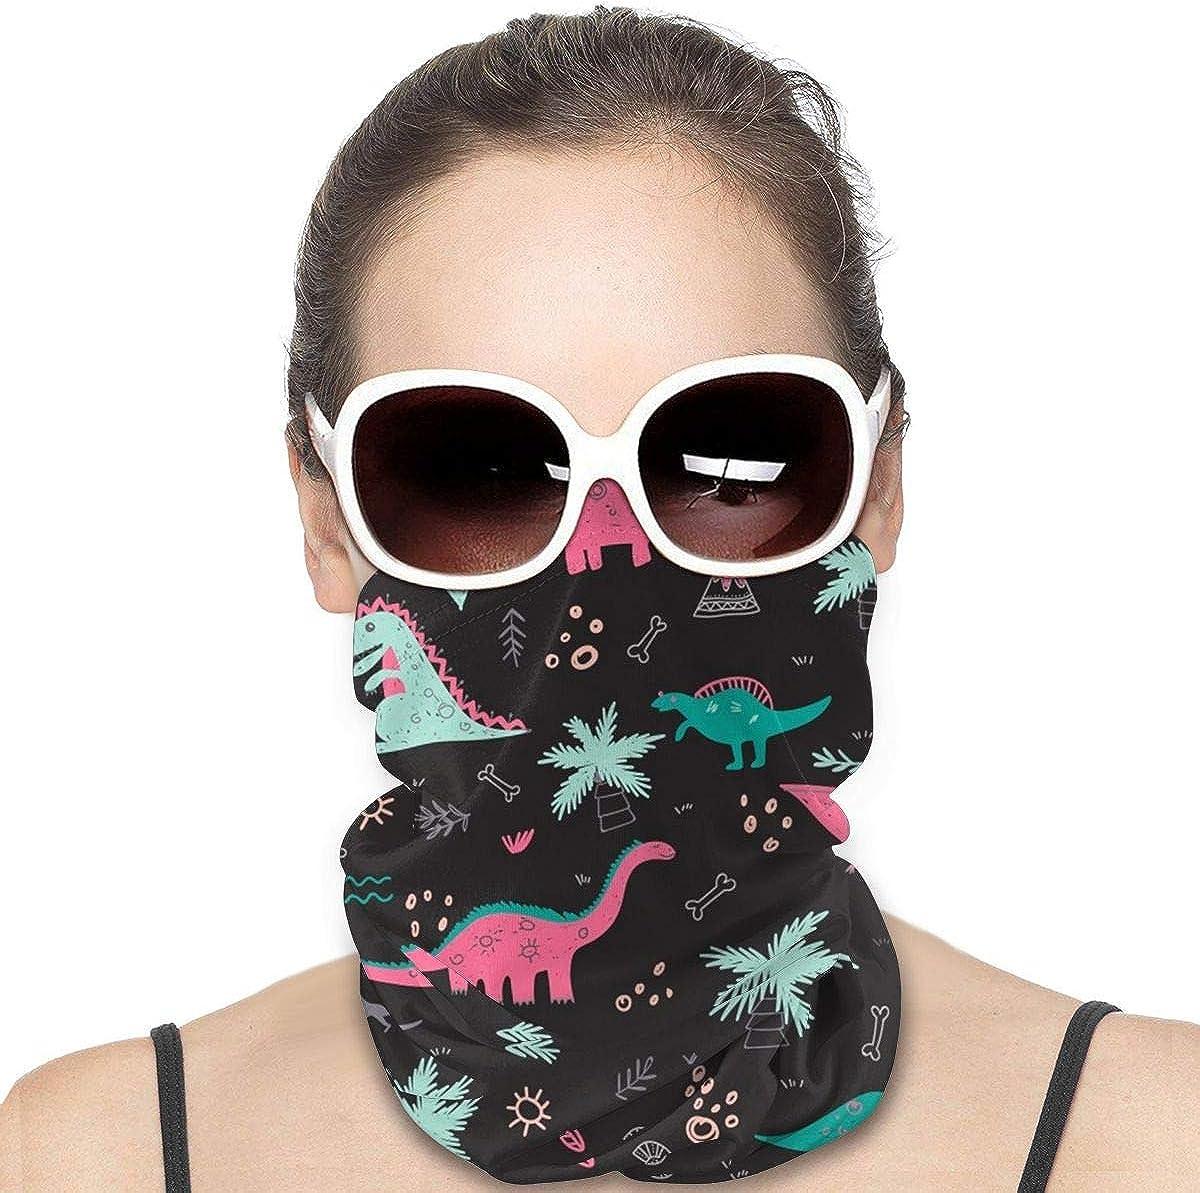 KiuLoam Women Bandanas Face Mask, Tropical Cartoon Dinosaurs Animal Pattern Neck Gaiter Mask Headband for Men Face Scarf Dust, Outdoors, Sports